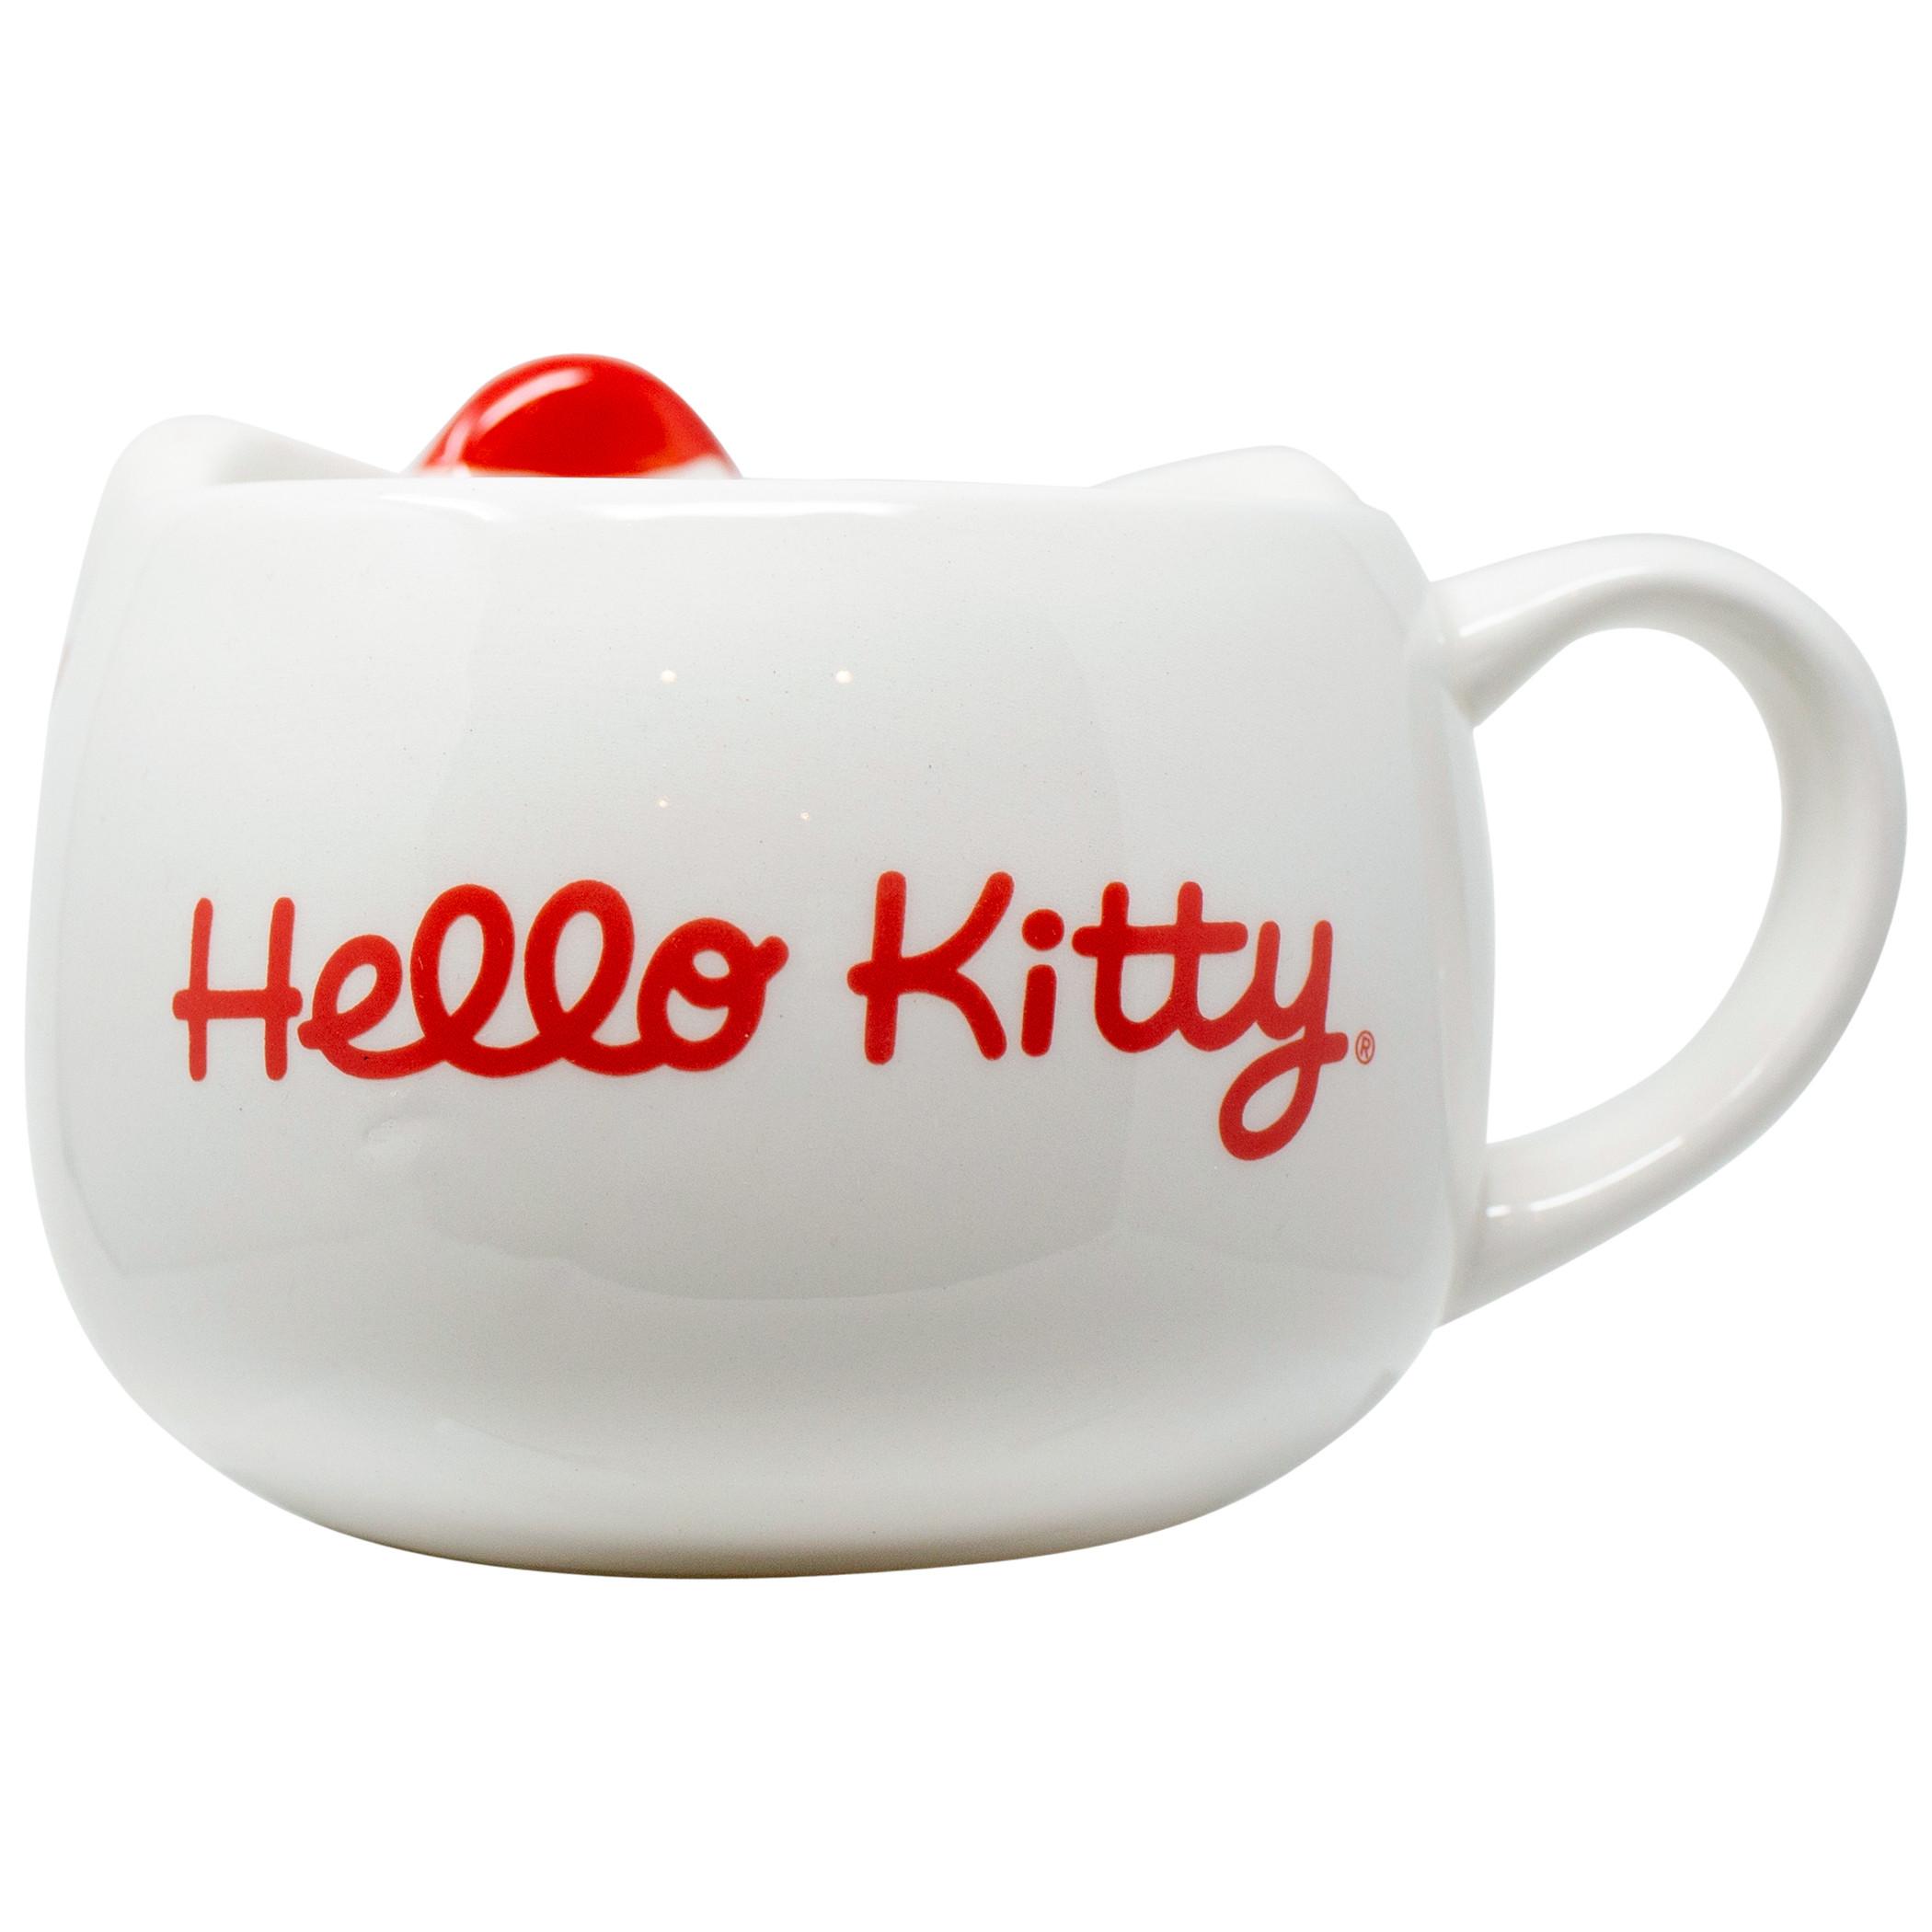 Hello Kitty 3D Sculpted Ceramic Mug